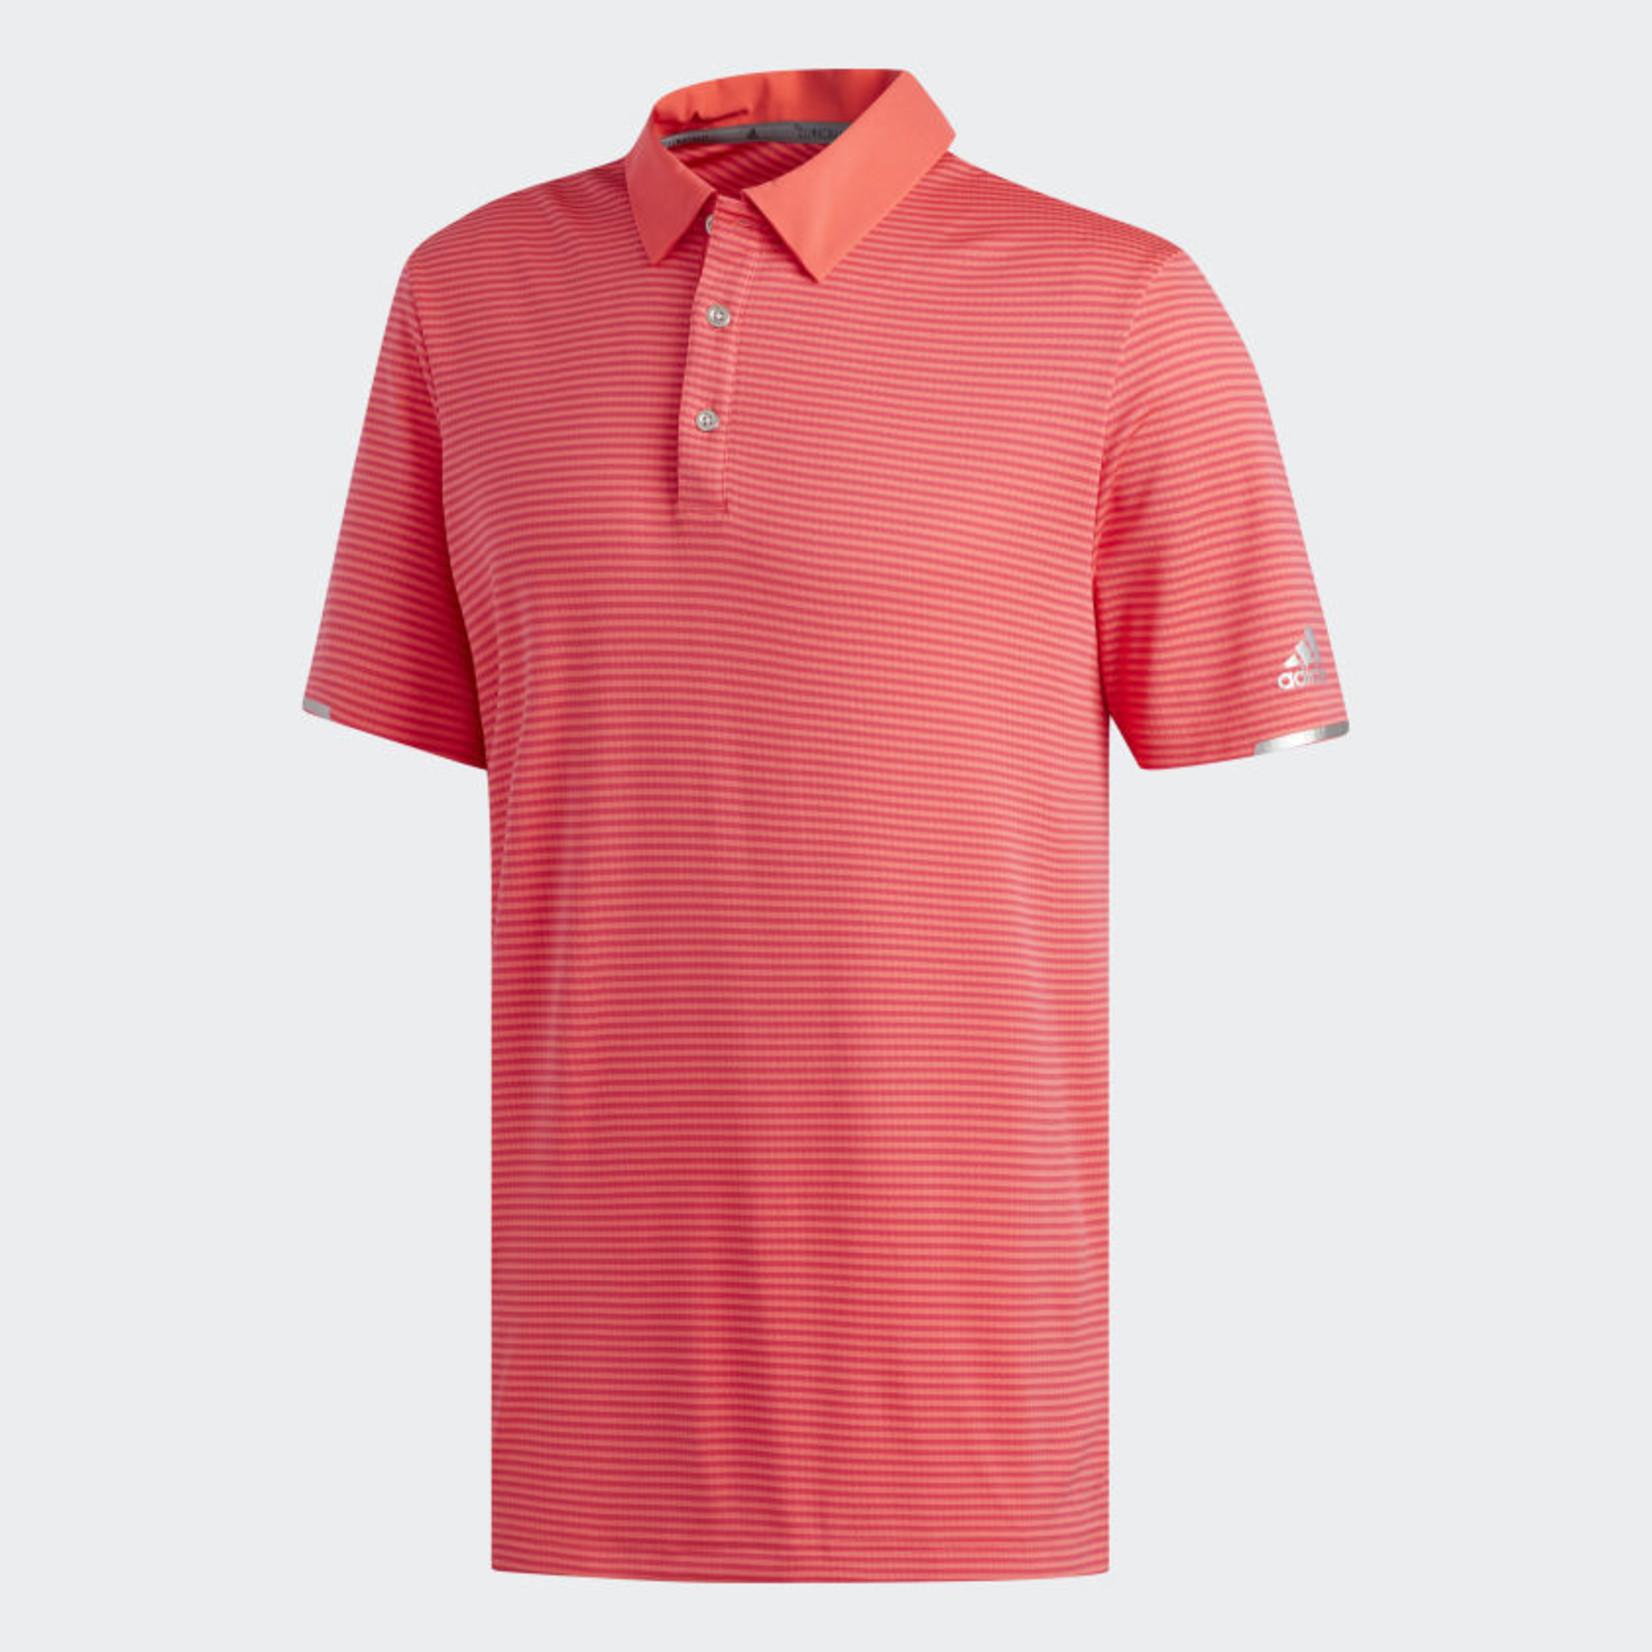 Adidas Adidas Men's Climachill Tonal Stripe Polo